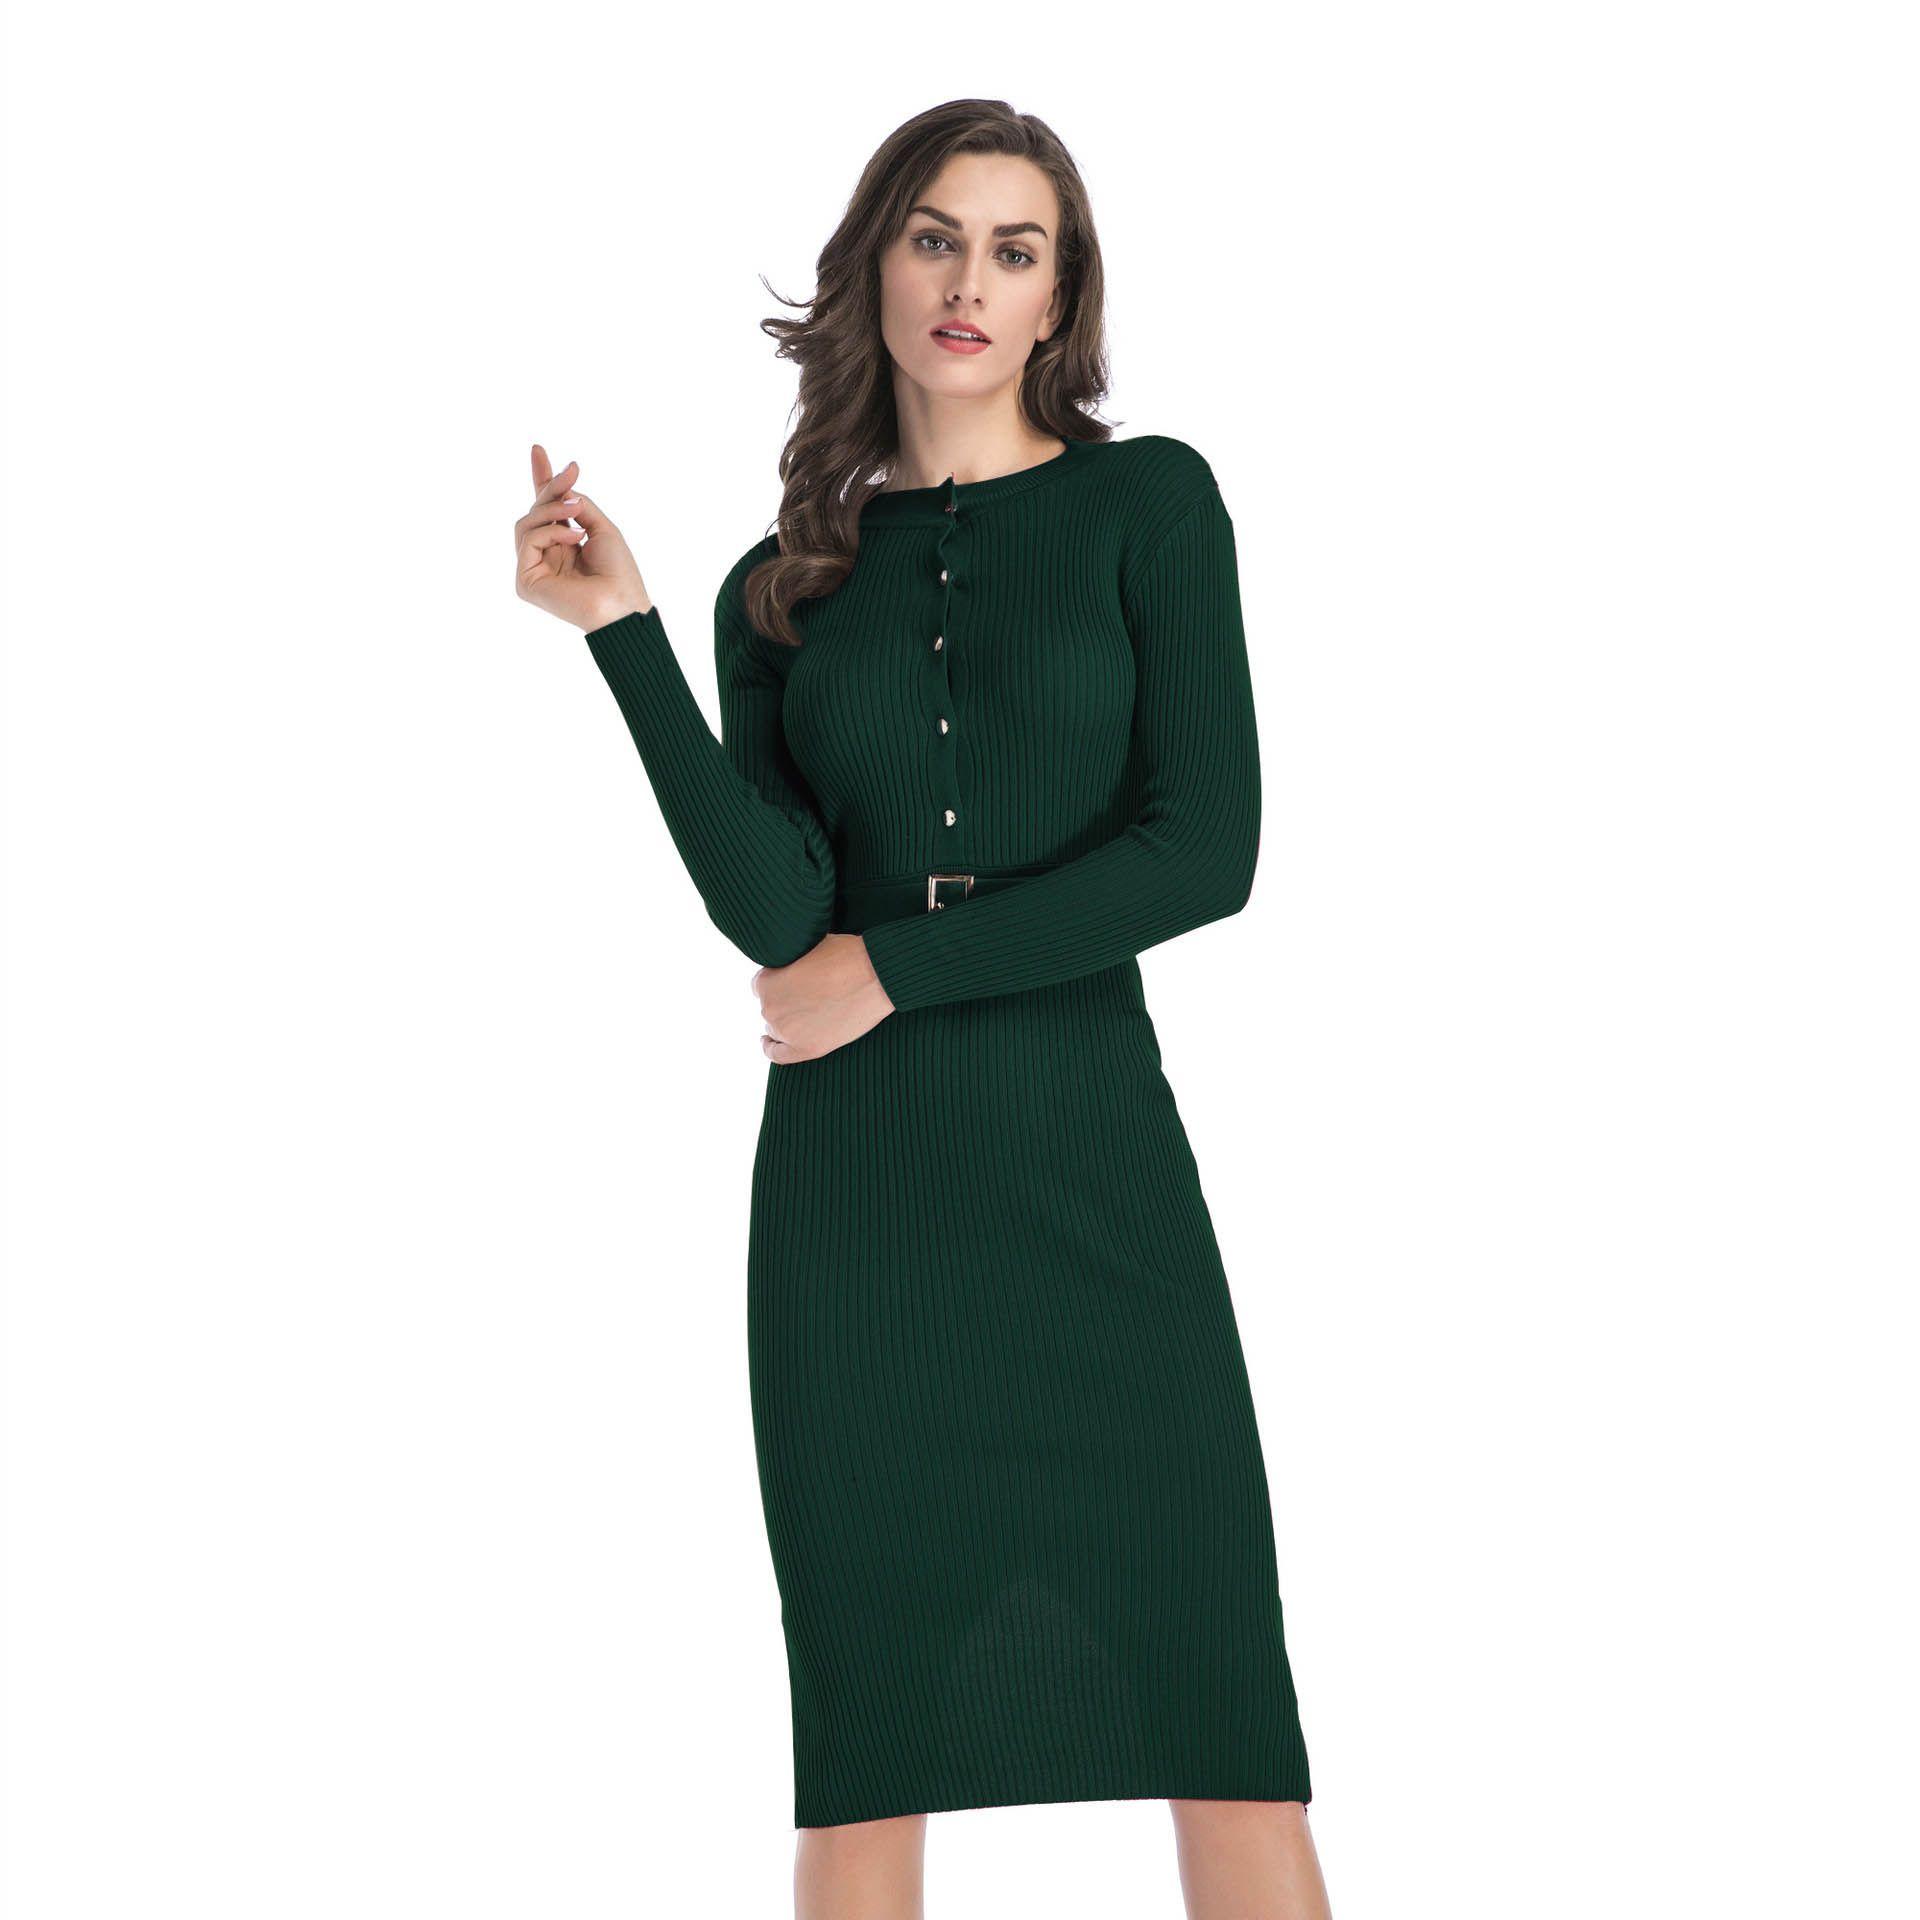 87de2634dcb Slim Fit Womens Dress Long-sleeved Knit Dresses Female Solid Color ...